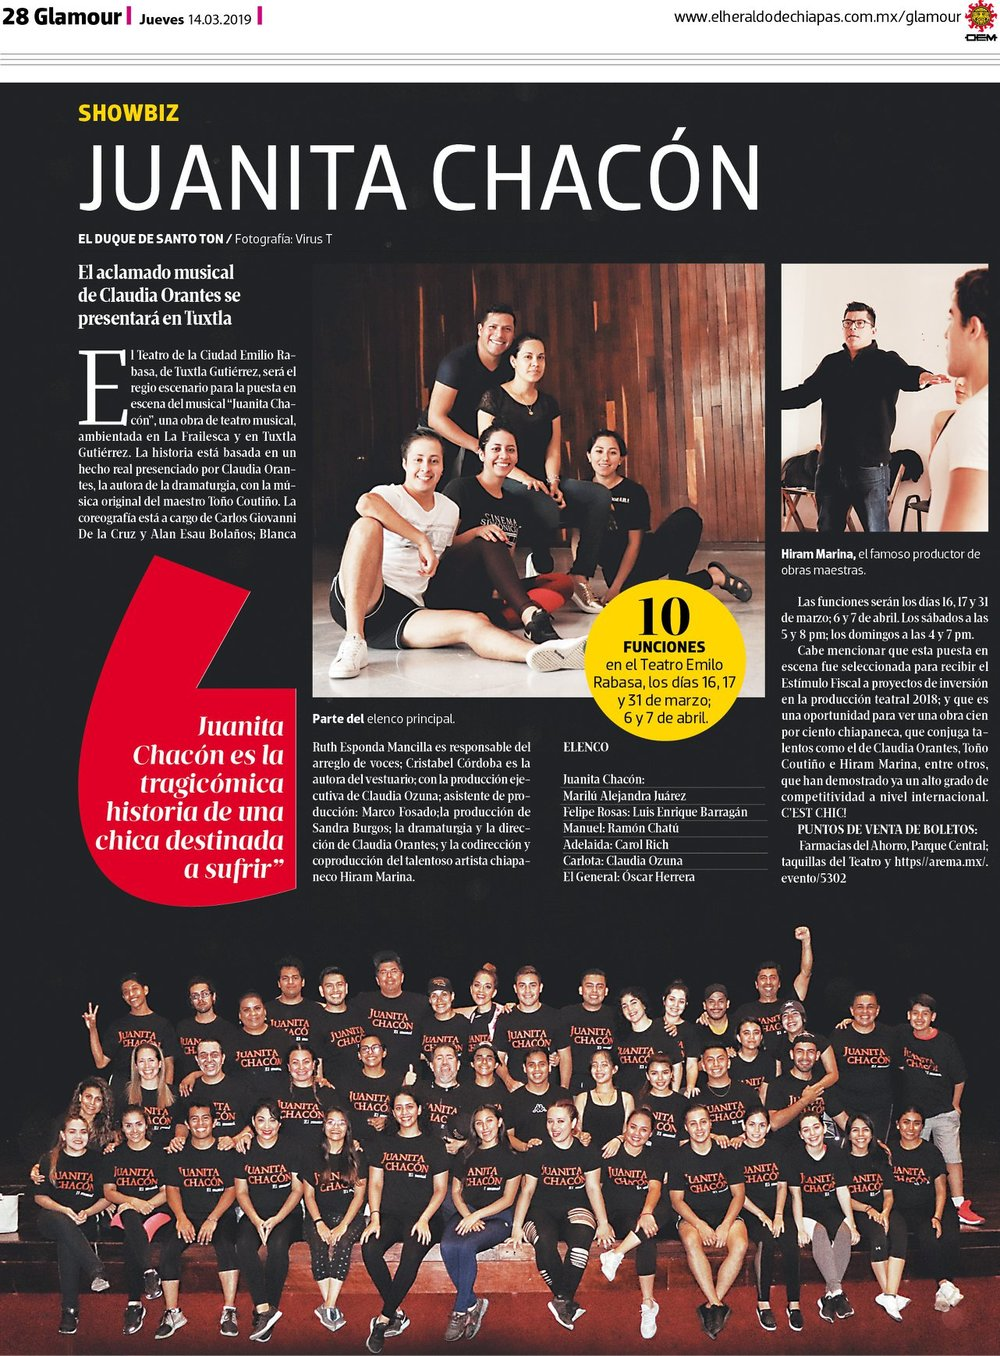 JuanitaChacon2.jpg